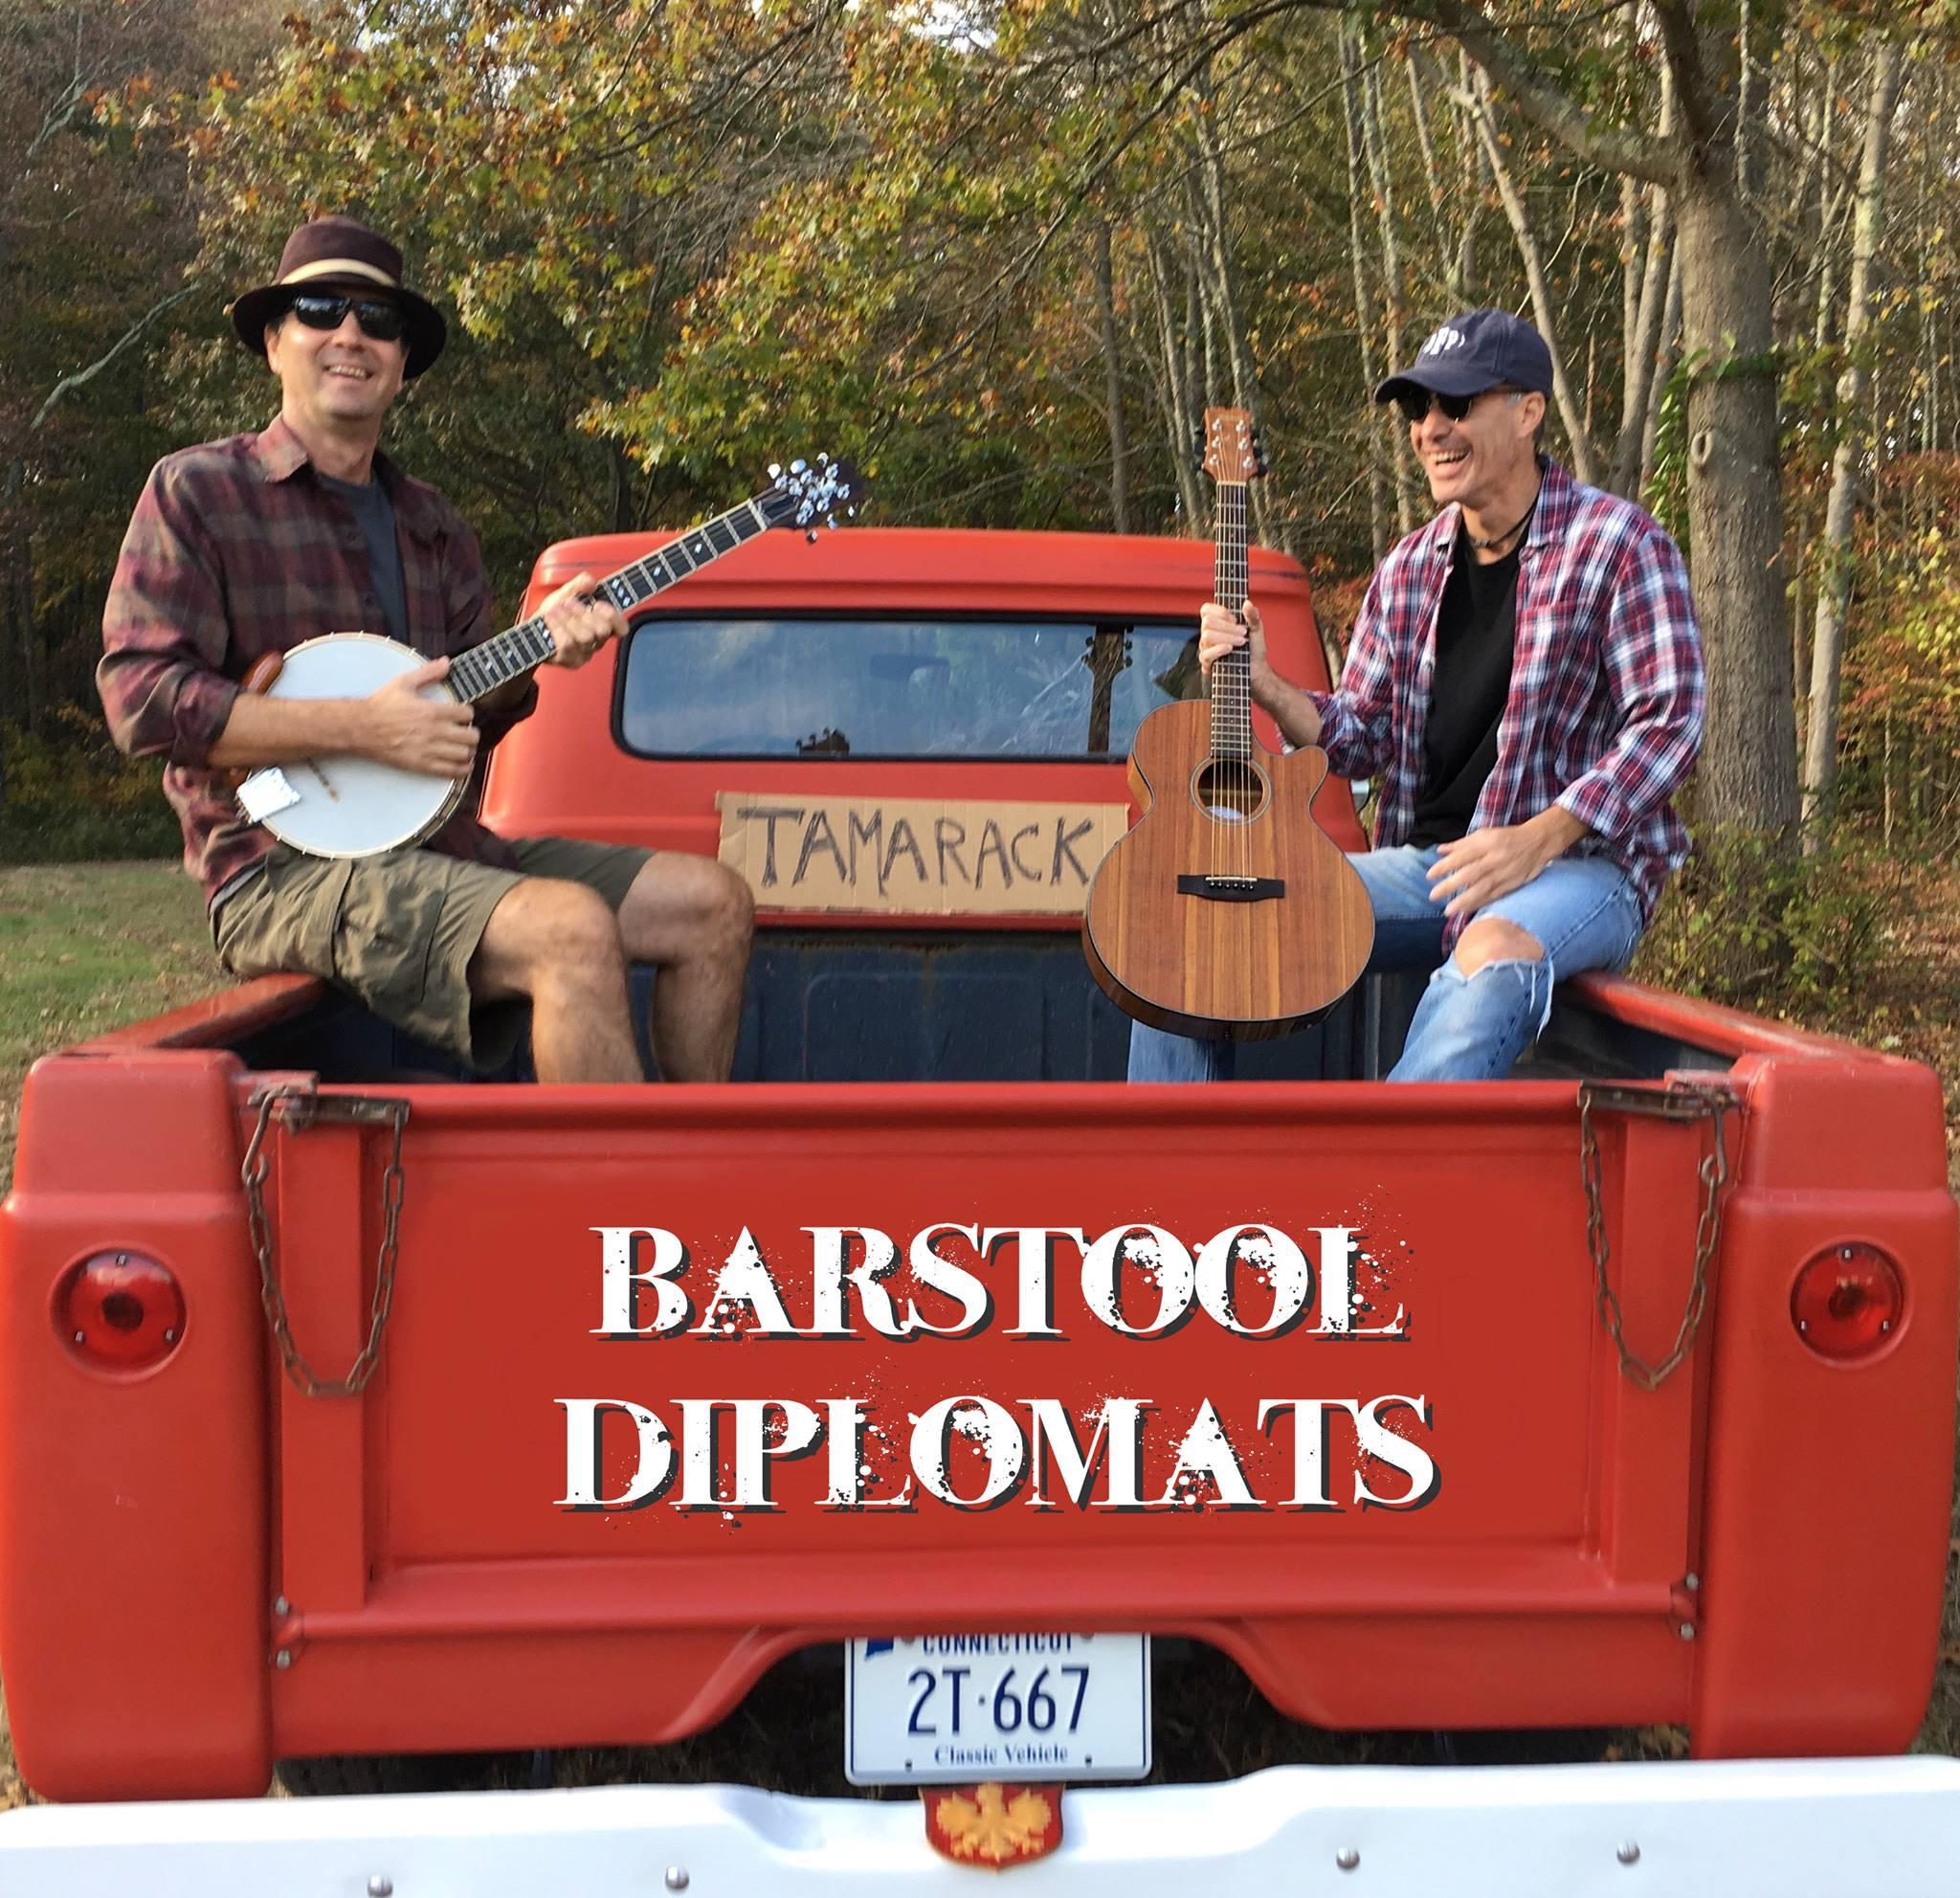 Barstool Diplomats